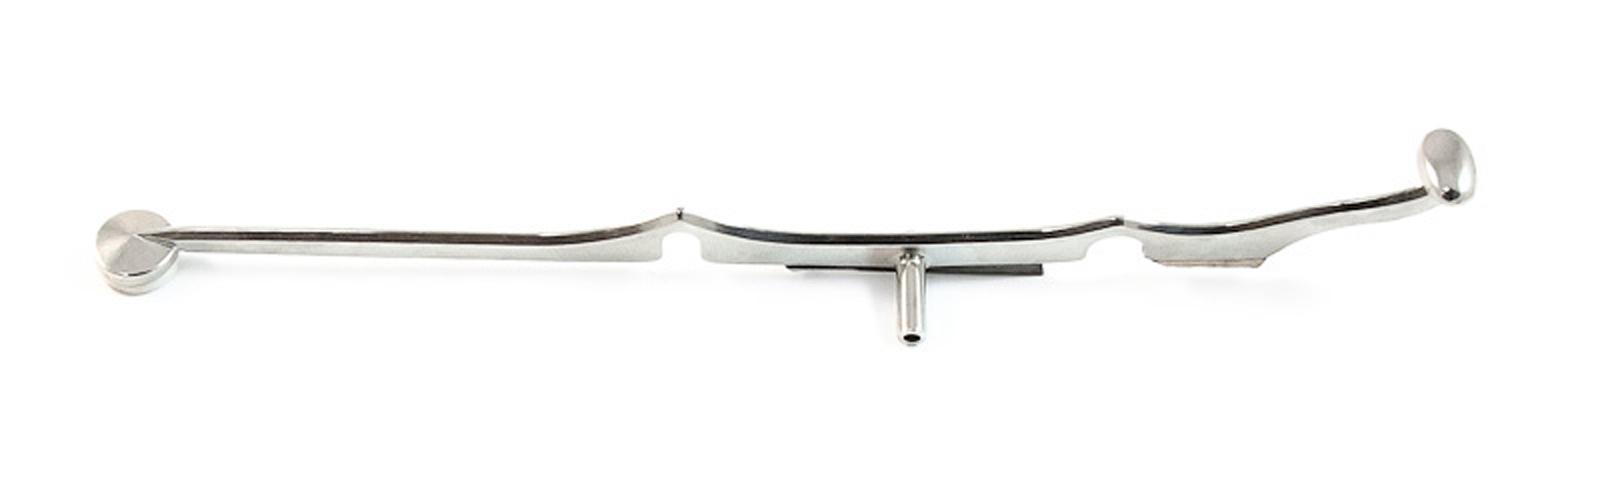 C Trill Key - No.13a - Clarinet Corton/B&H400/AK